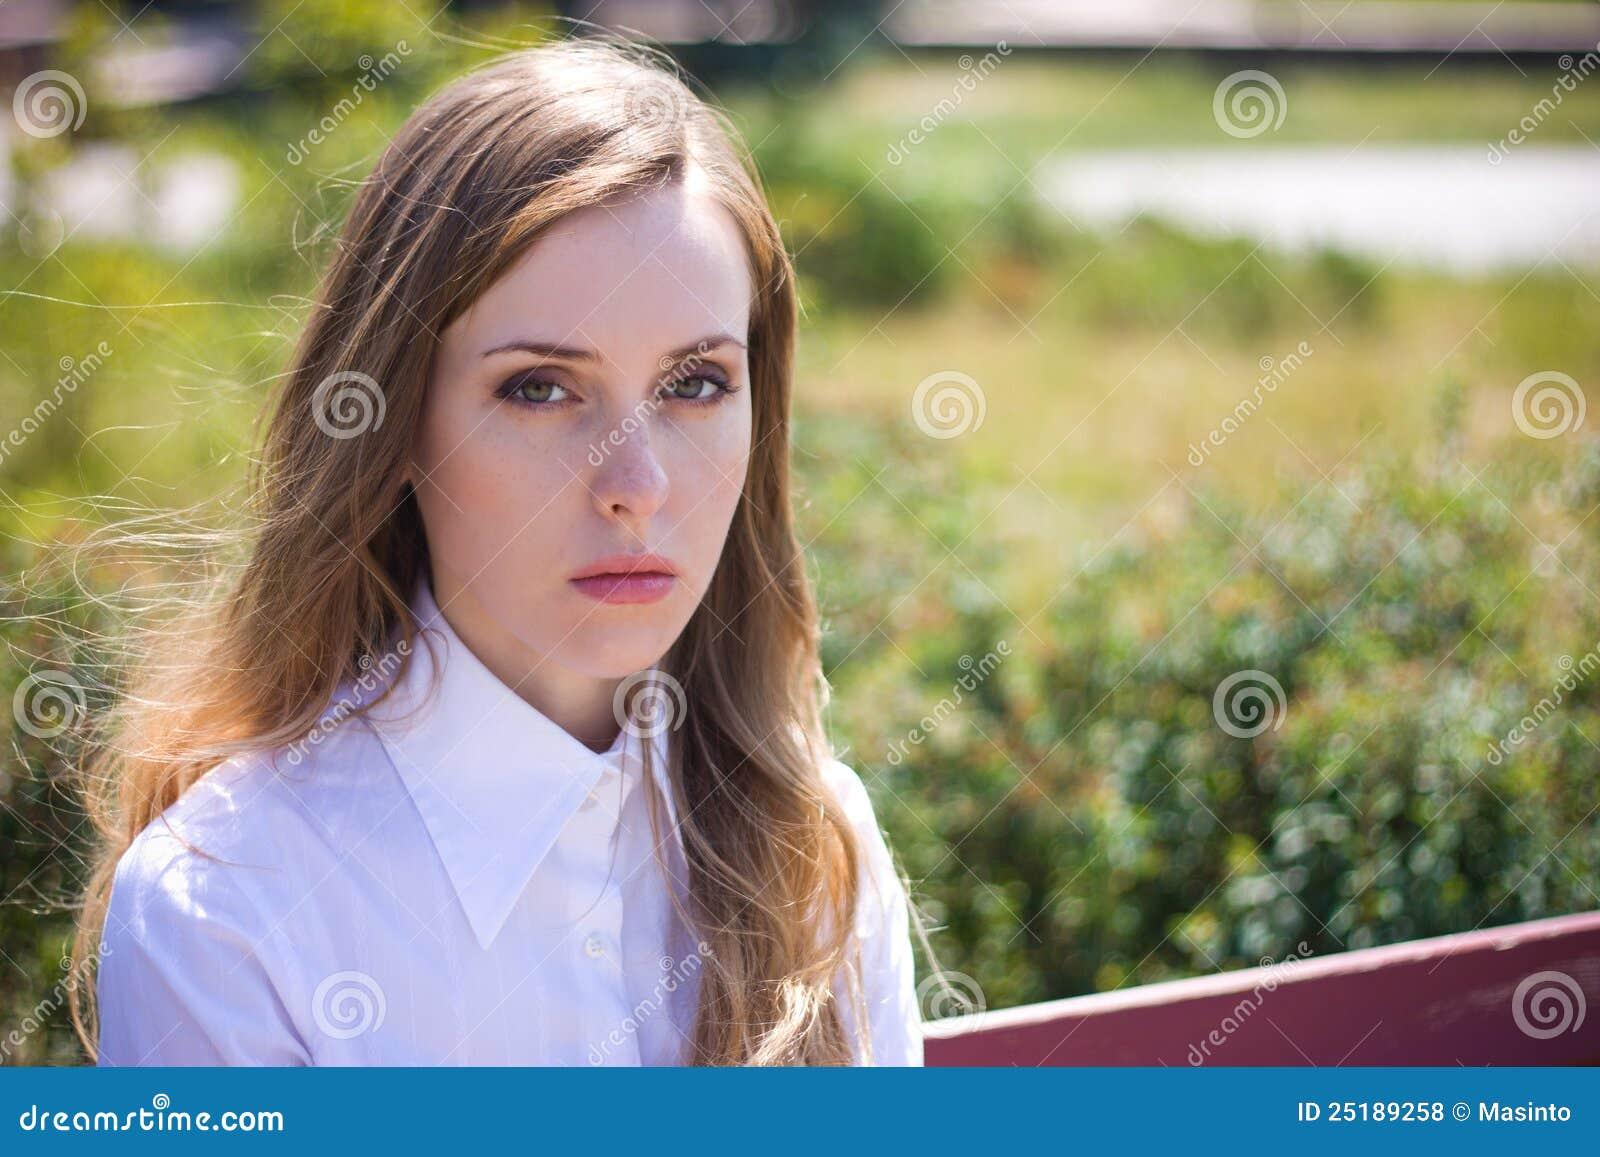 La donna triste esamina la macchina fotografica